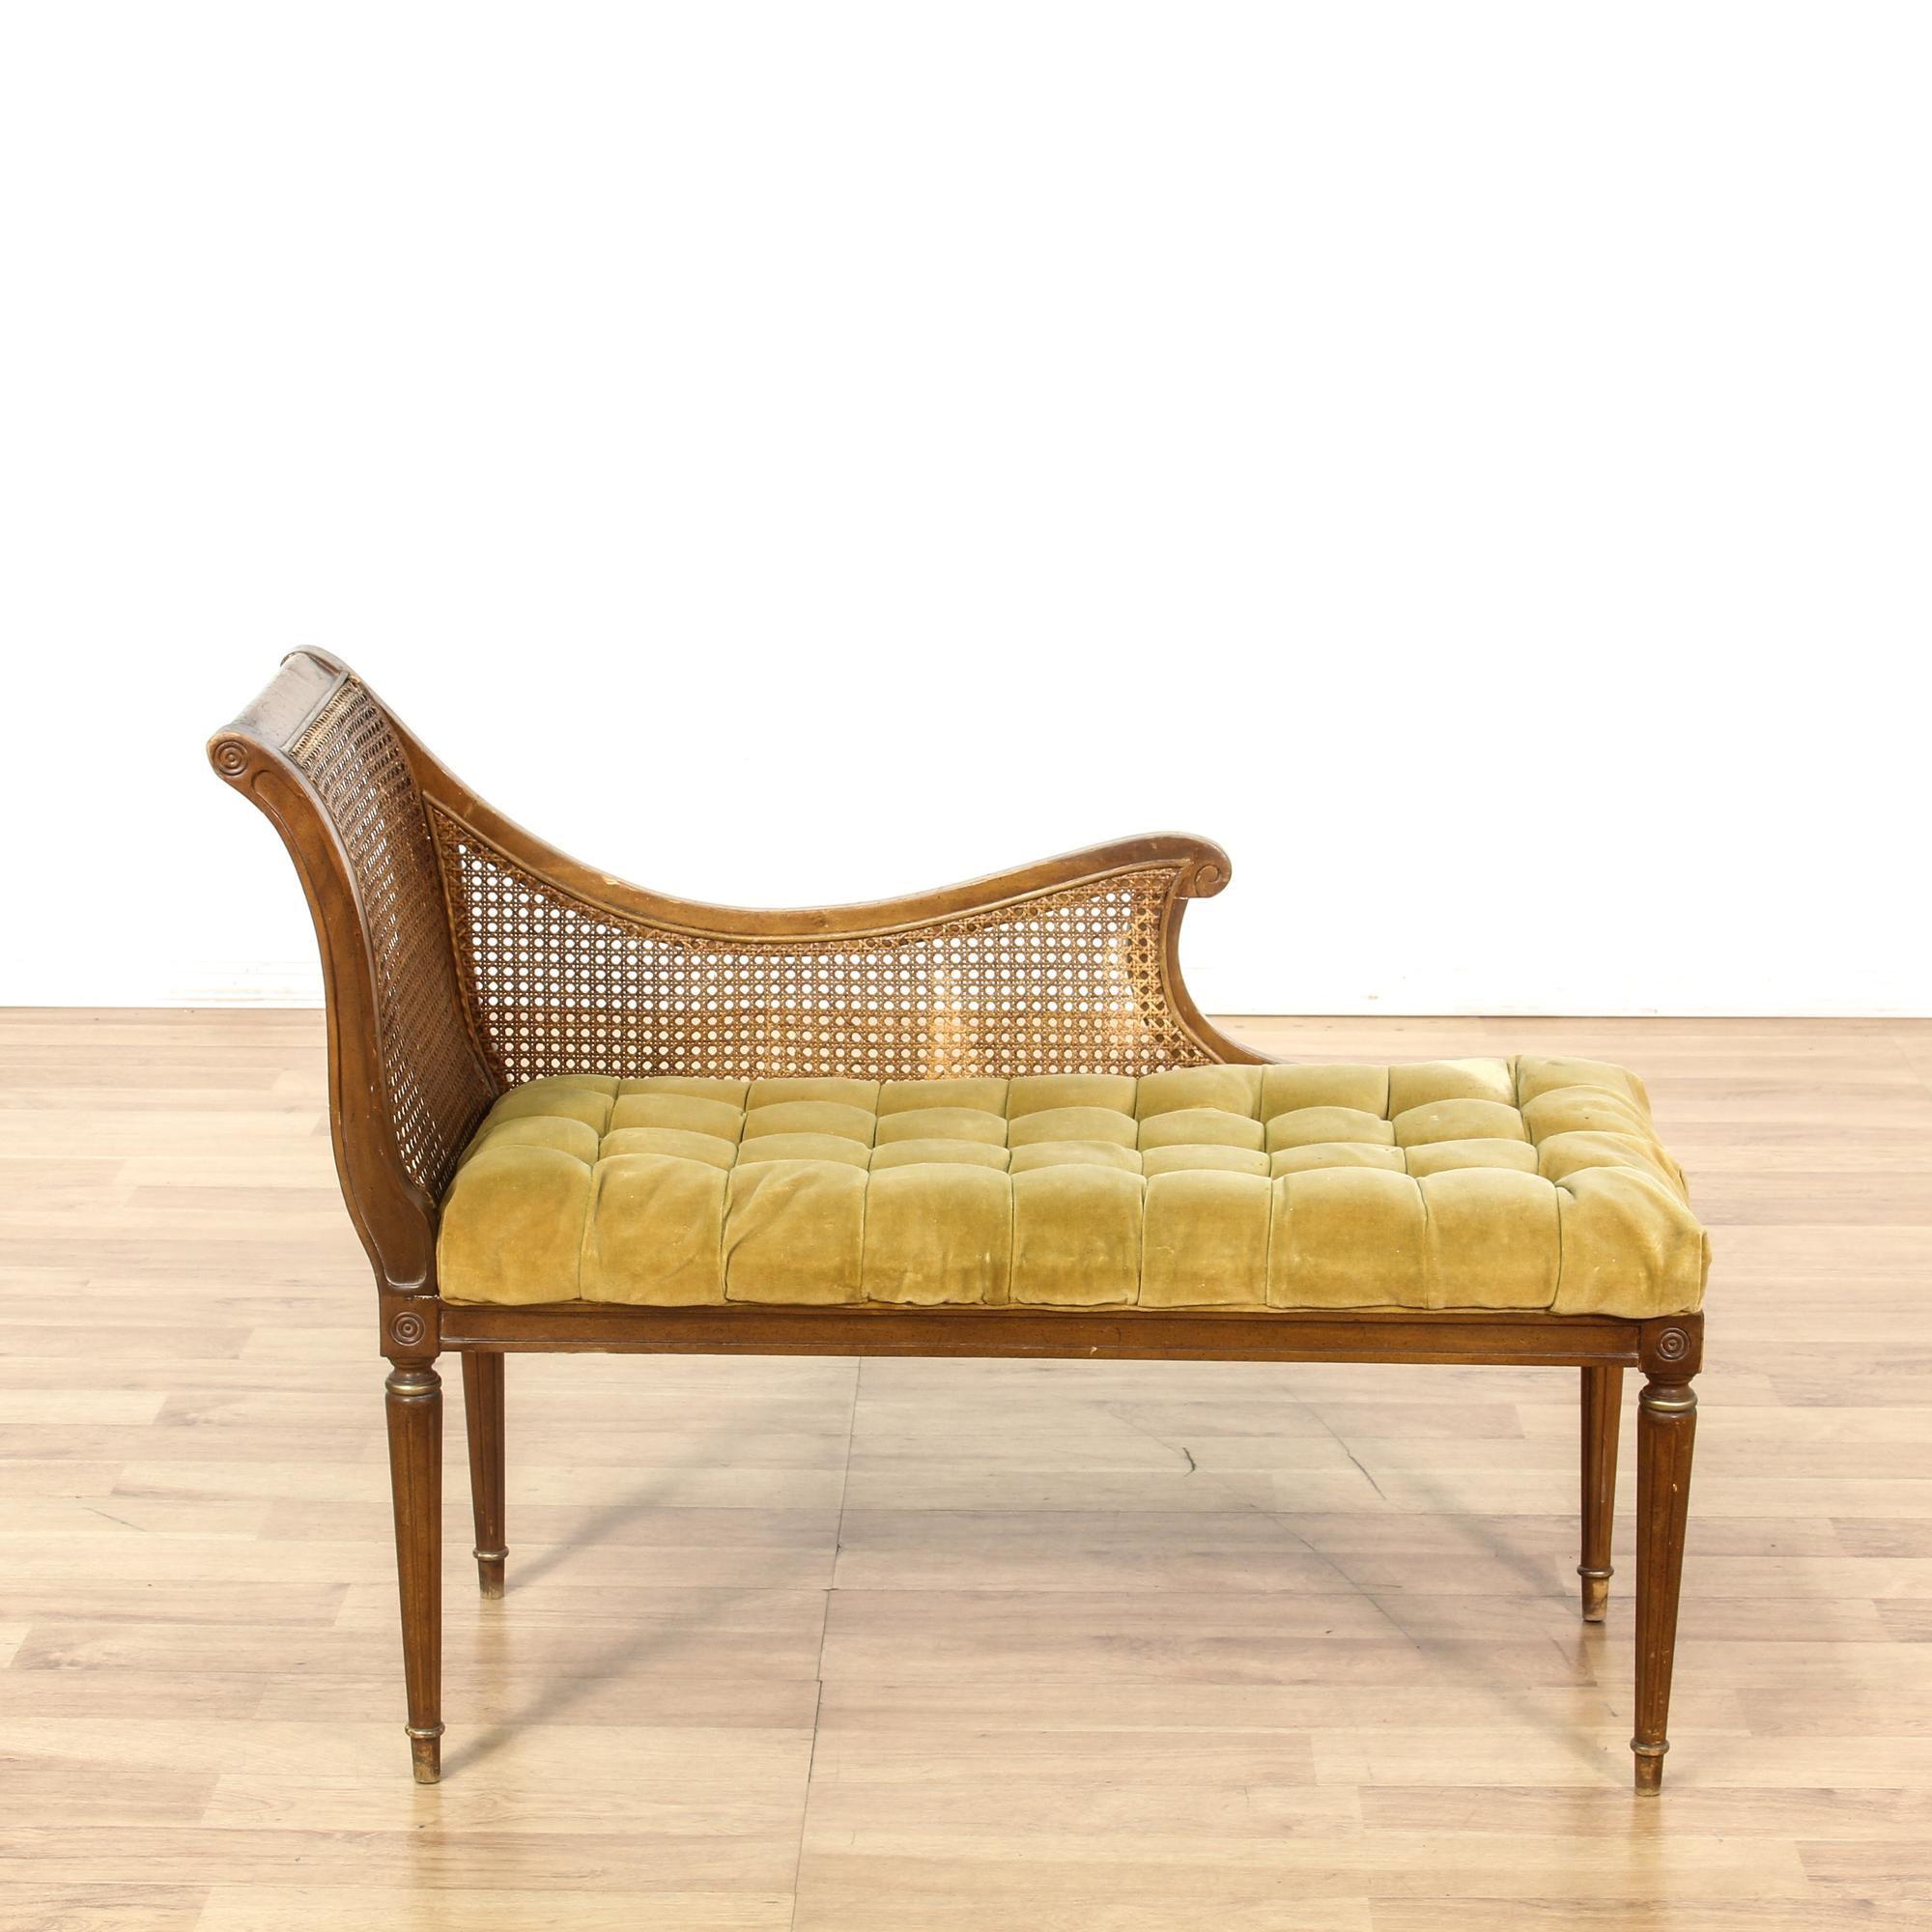 Wicker Back Tufted Velvet Chaise Lounge | Loveseat Vintage Furniture San  Diego U0026 Los Angeles